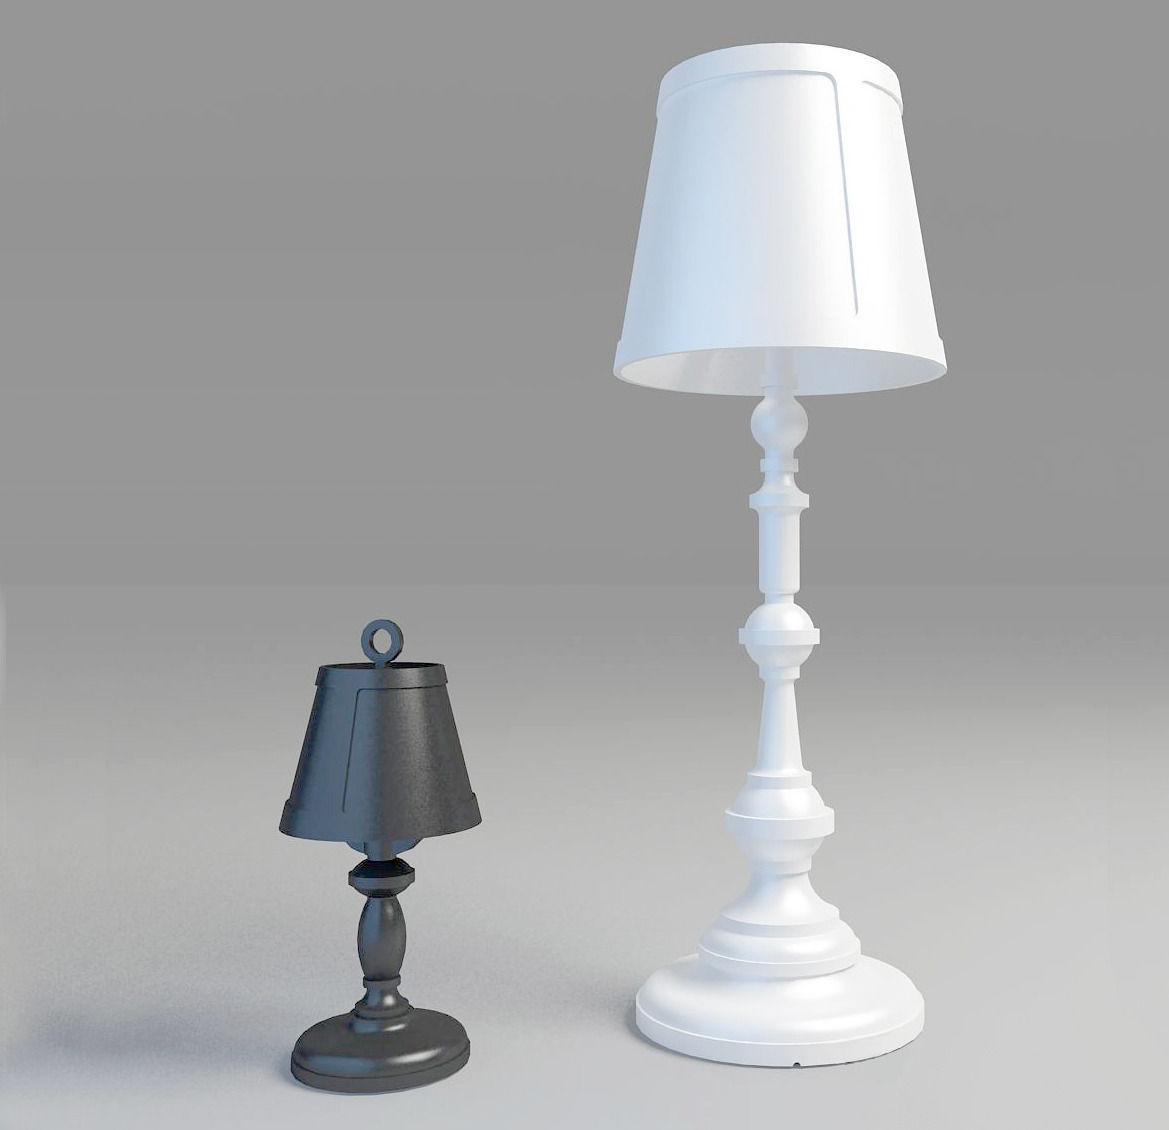 Floor lamp moooi 3d model max 3ds fbx cgtradercom for Floor lamp 3ds max free model